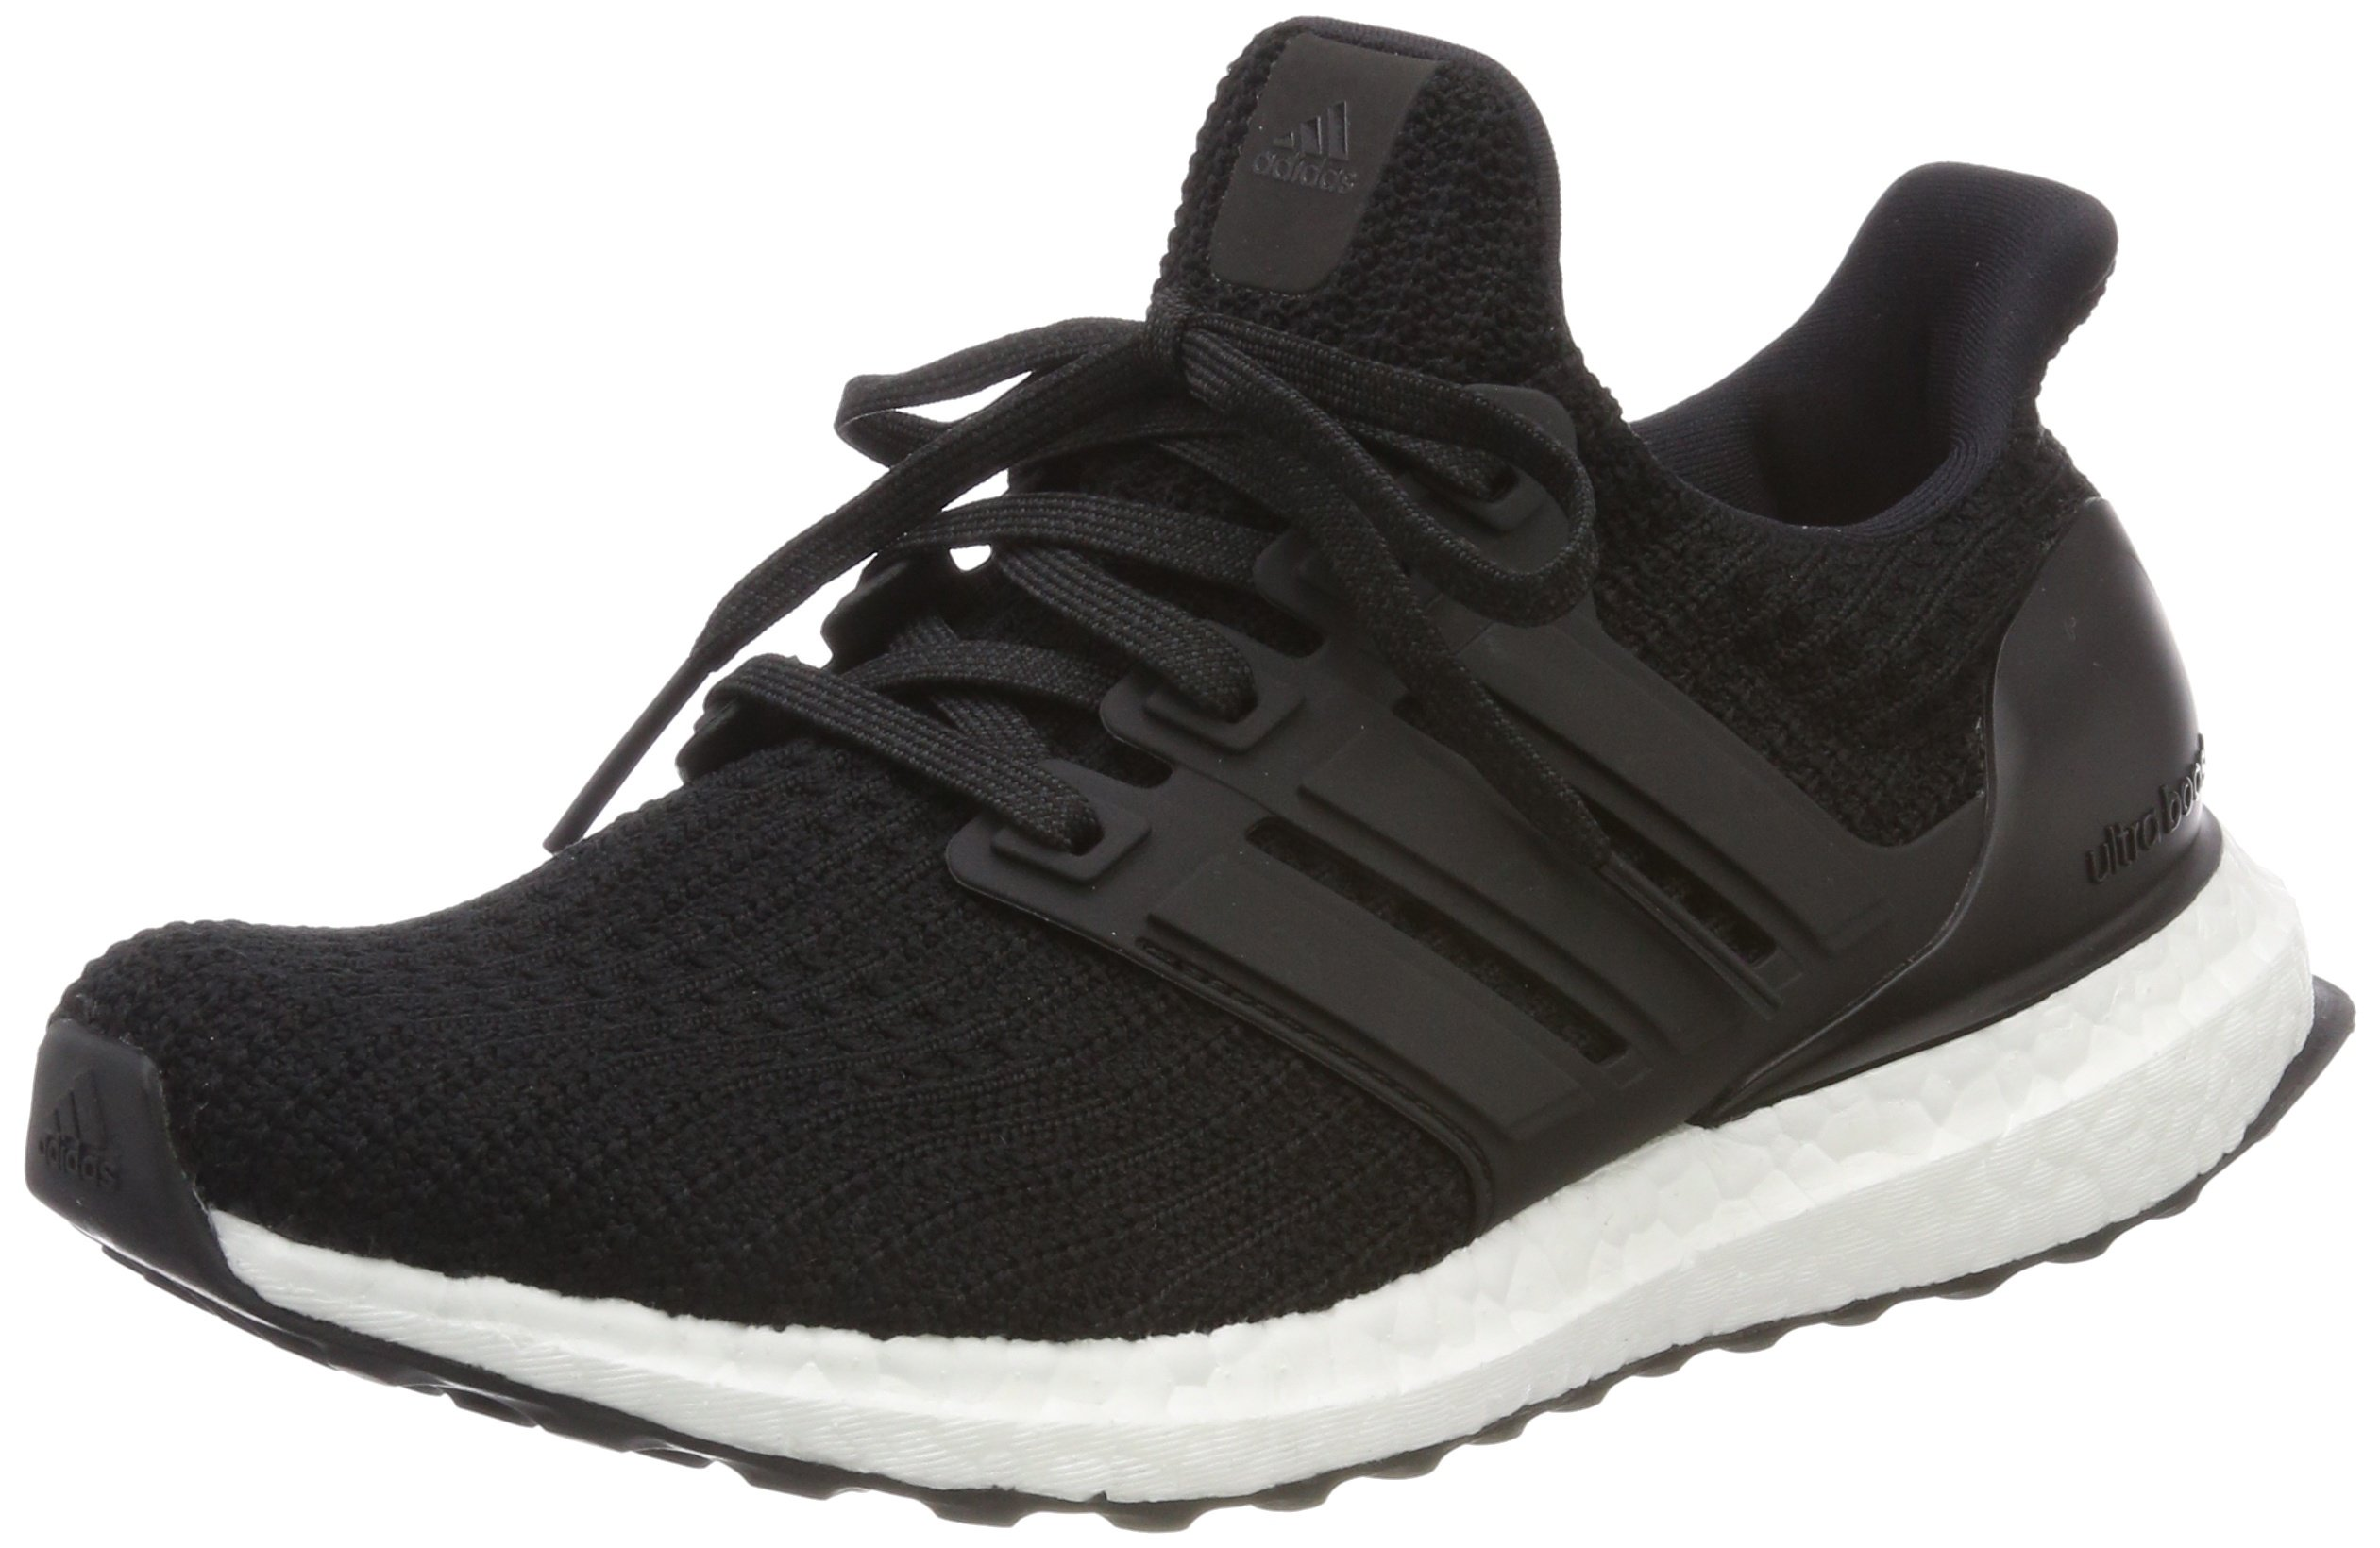 145bb5e90f2b9 adidas Ultraboost Women s Running Shoes - SS19-8.5 - Black